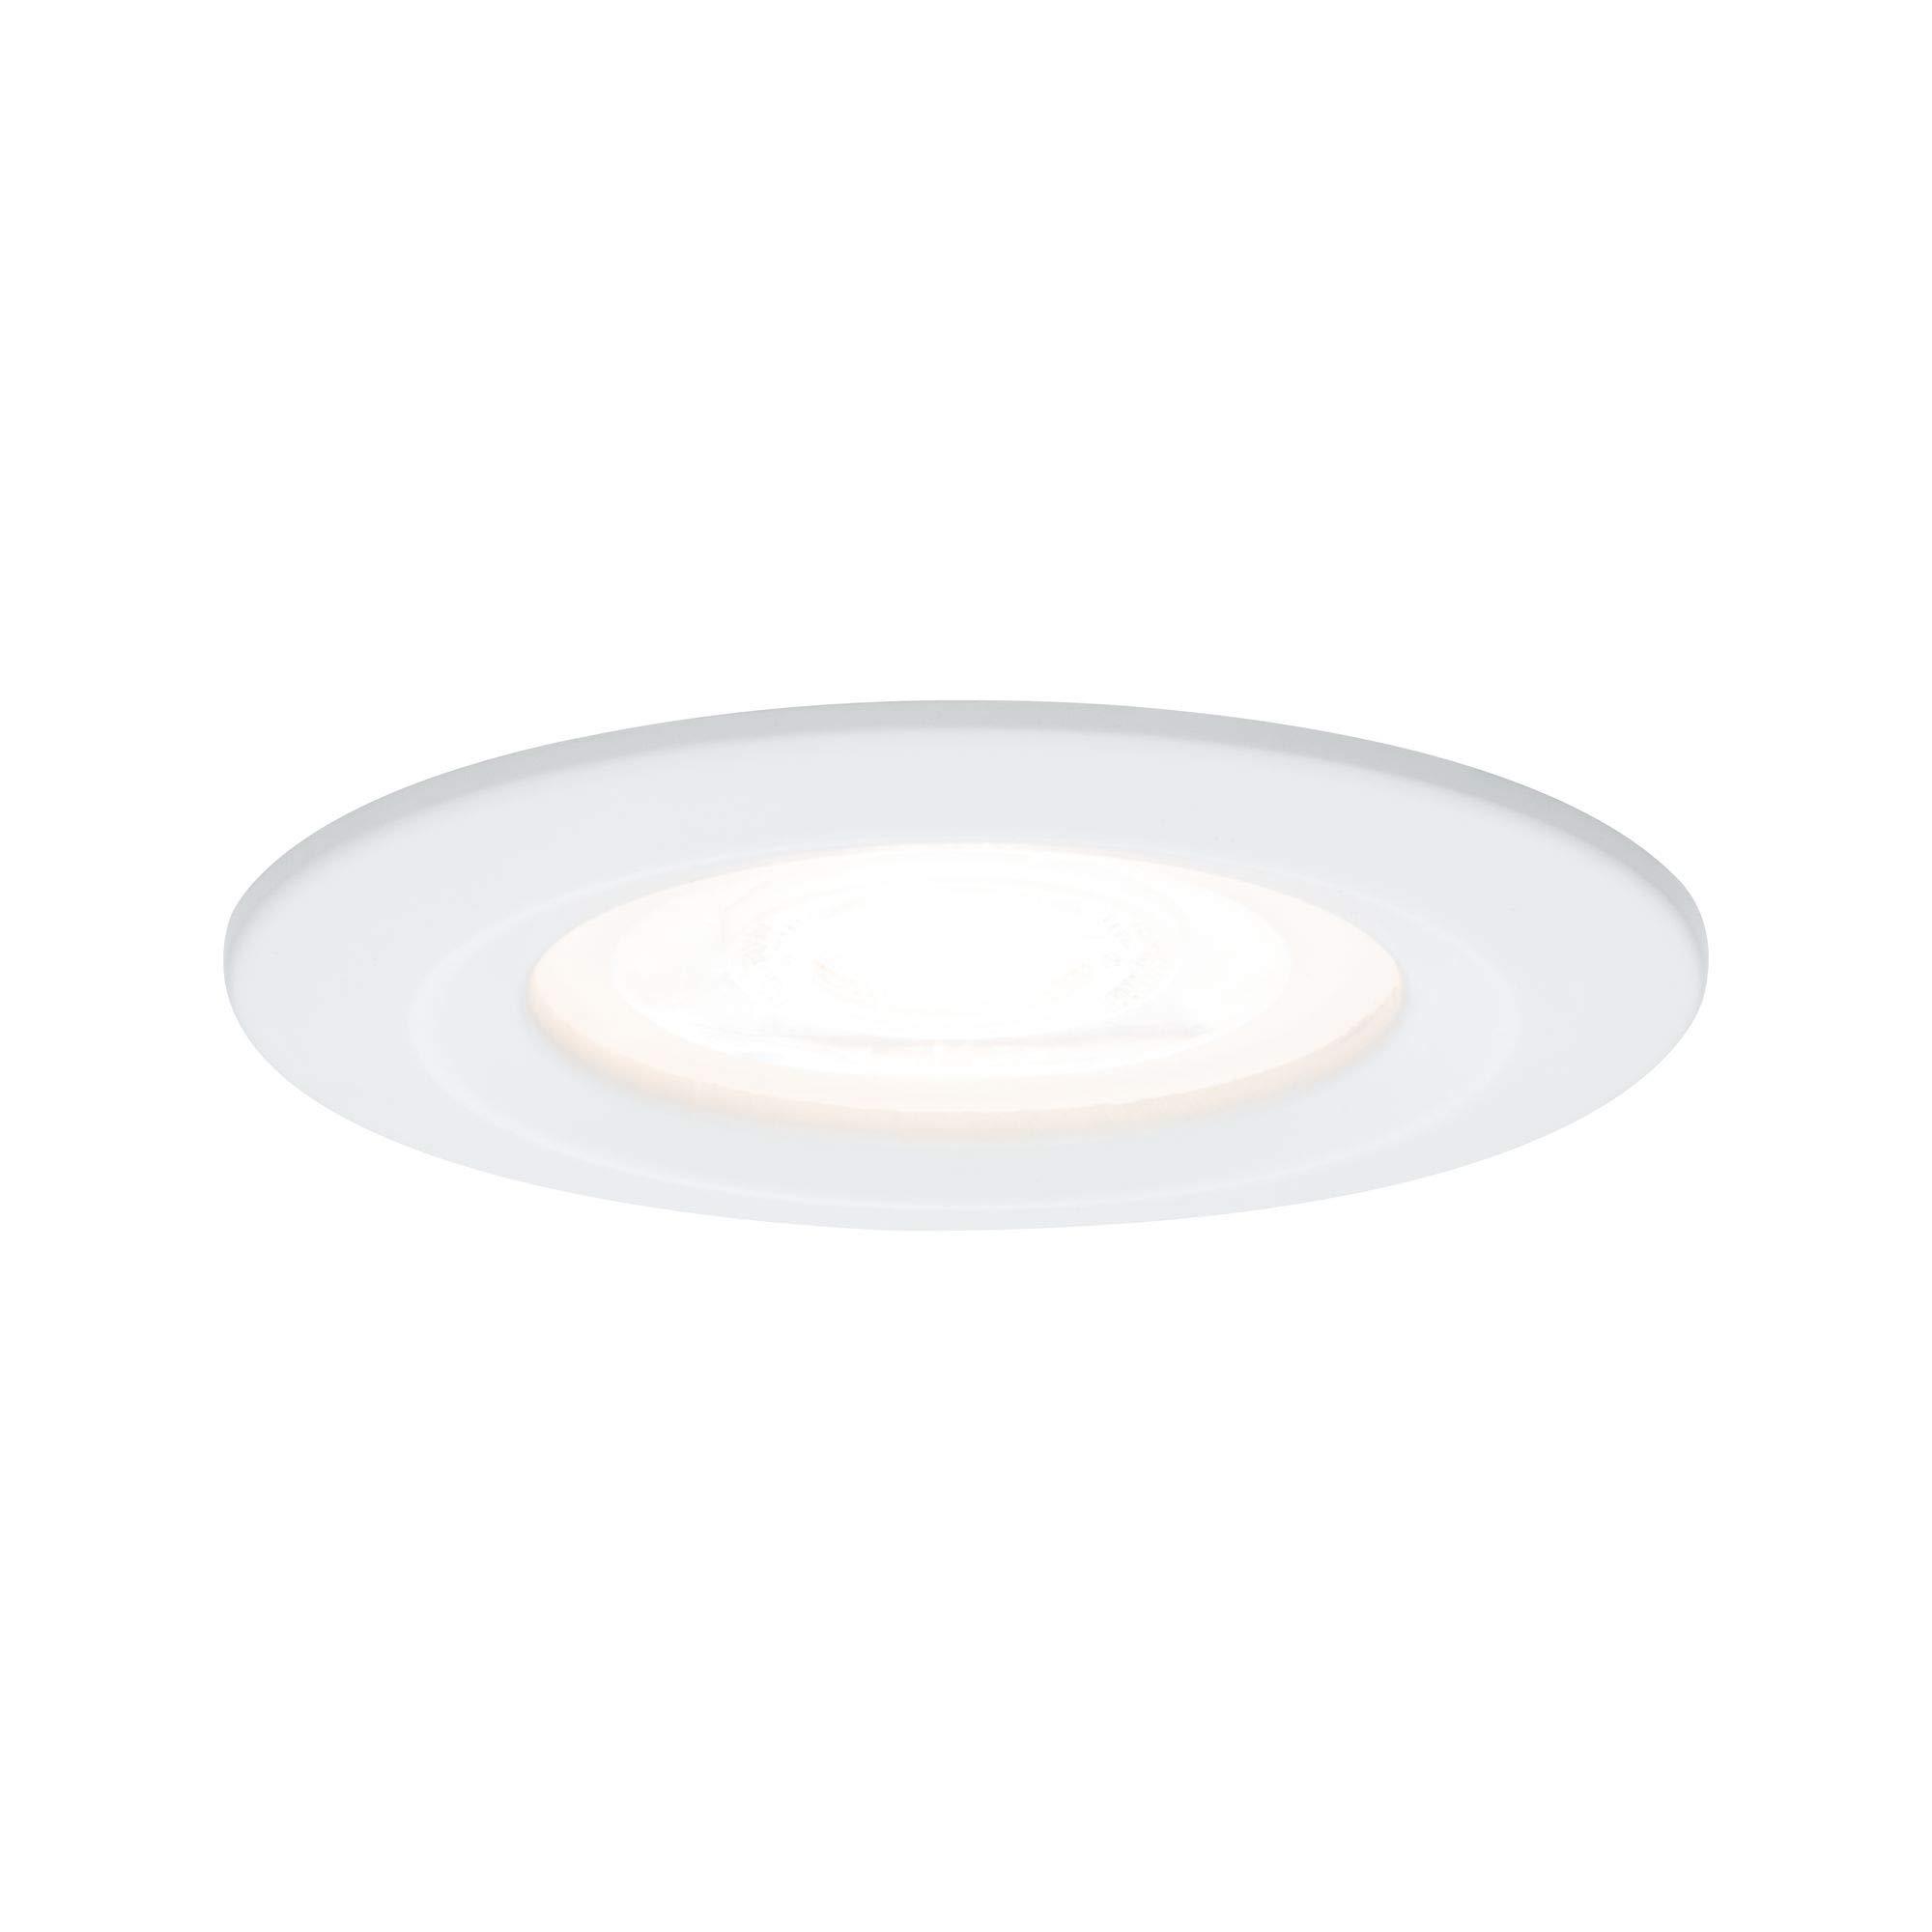 Paulmann 柏曼灯具 Paulmann 93653 LED Nova 嵌入式射灯 圆形吸顶灯 3 x 5.5 W 嵌入式灯 白色 IP44 防溅水 天花板嵌入式射灯 嵌入式灯 铝制 5.5 W 哑光